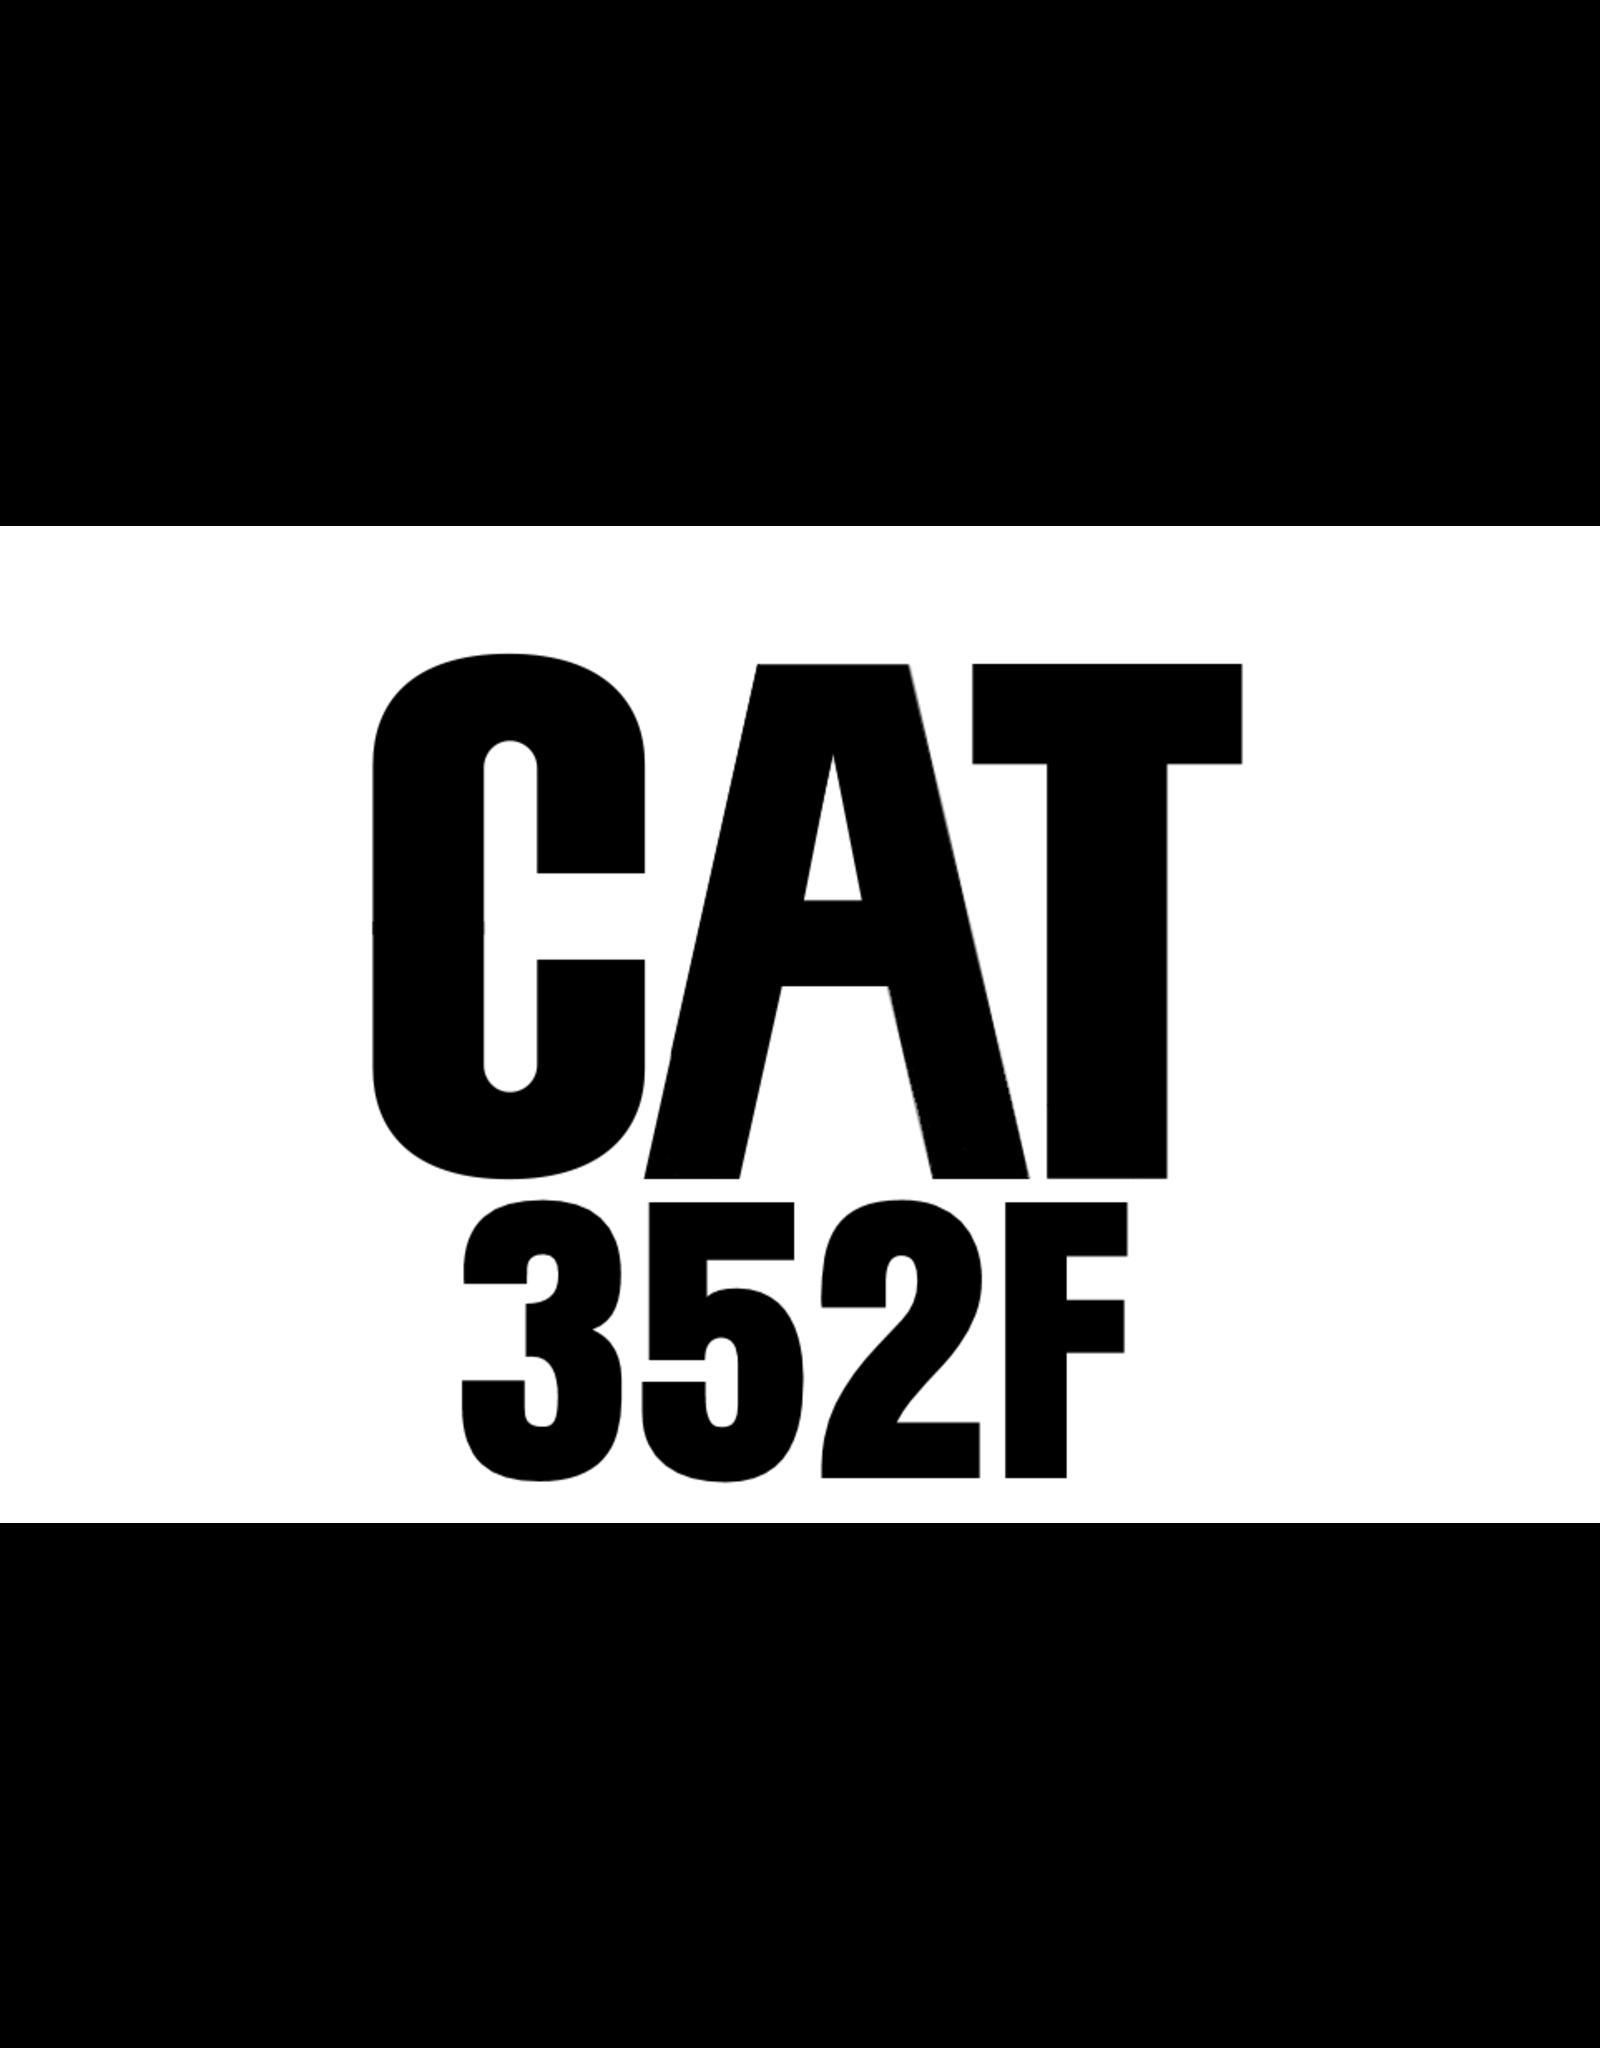 Echle Hartstahl GmbH FOPS for CAT 352F